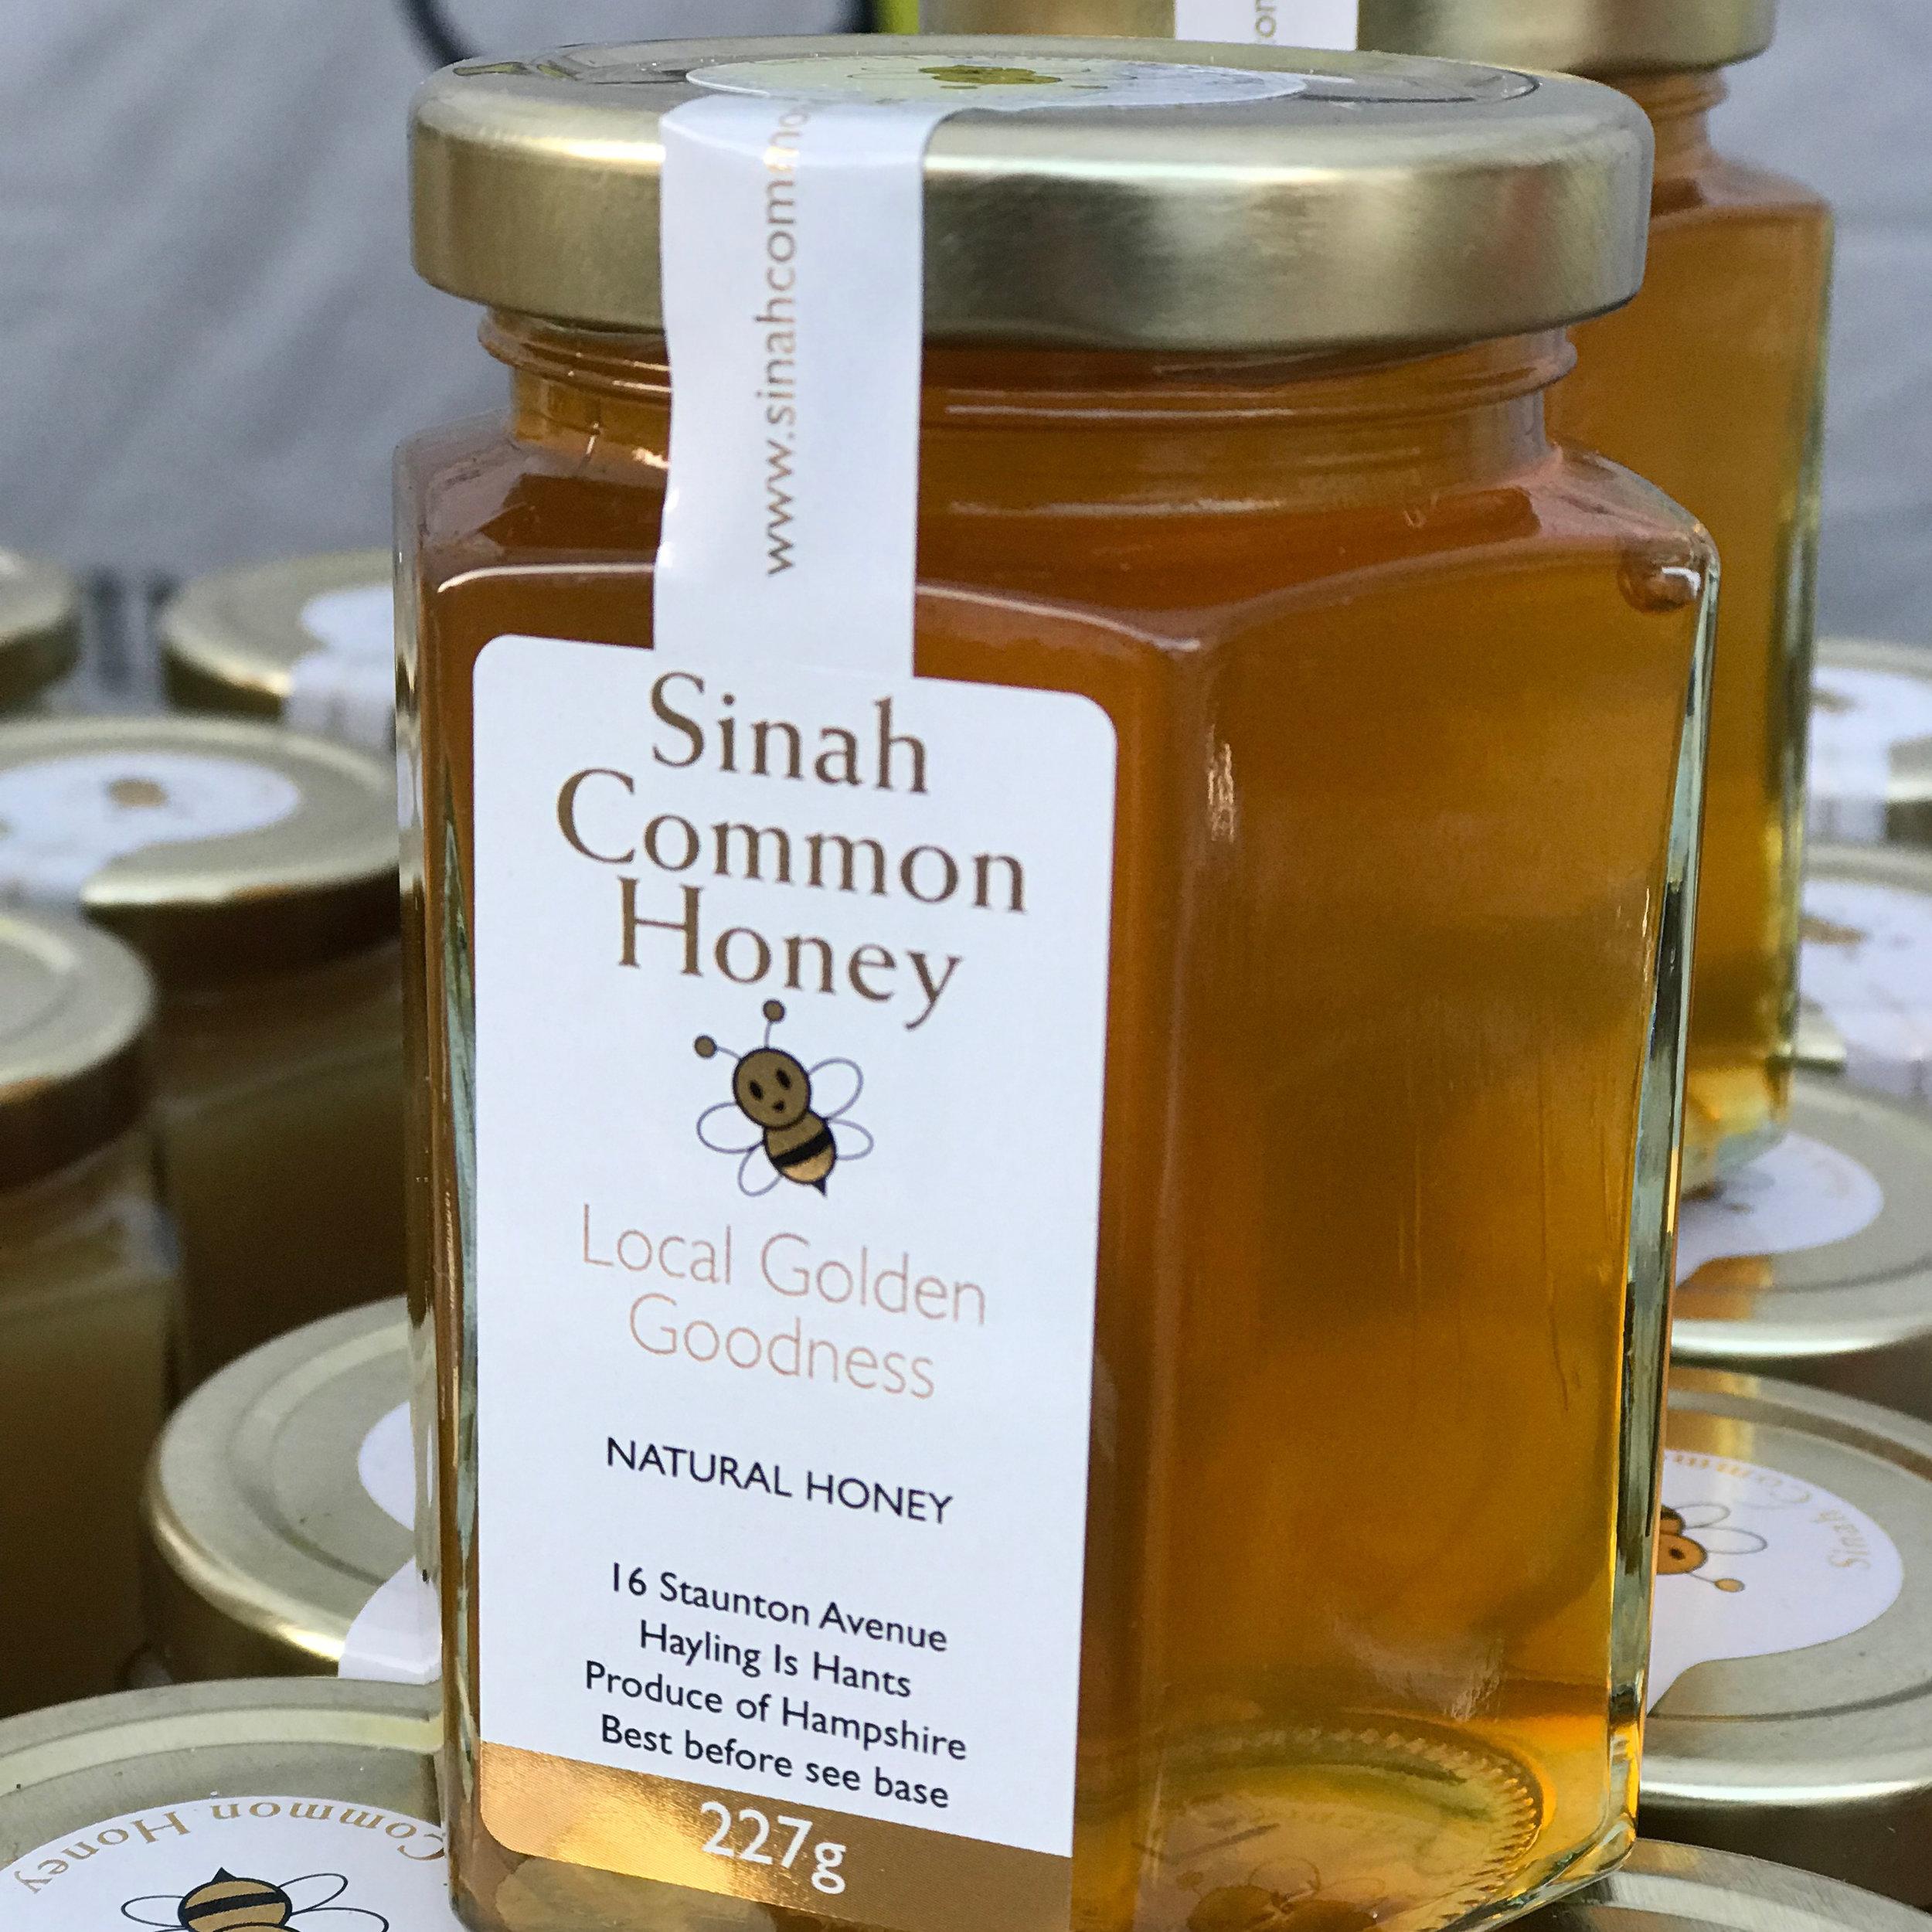 sinah-common-honey-jar